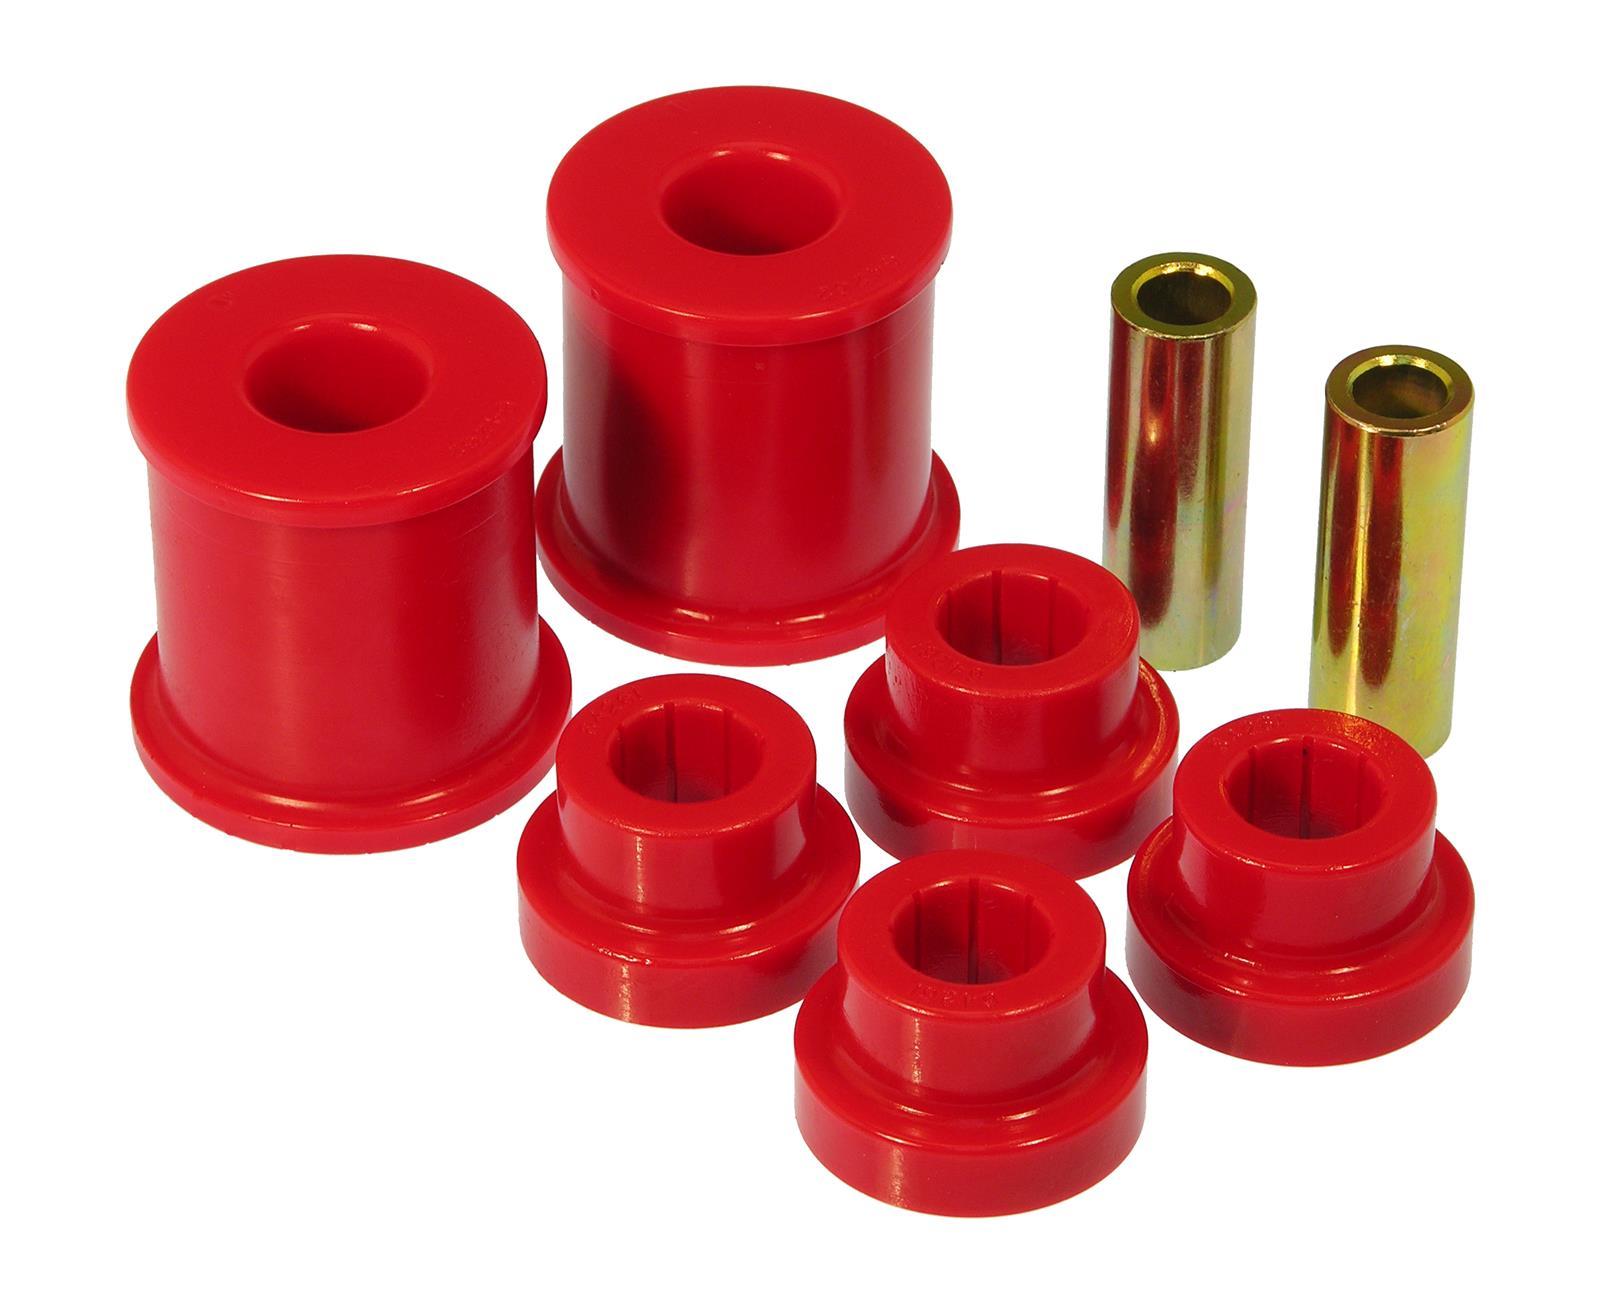 Prothane 6-308 Red Rear Trailing Arm Bushing Kit